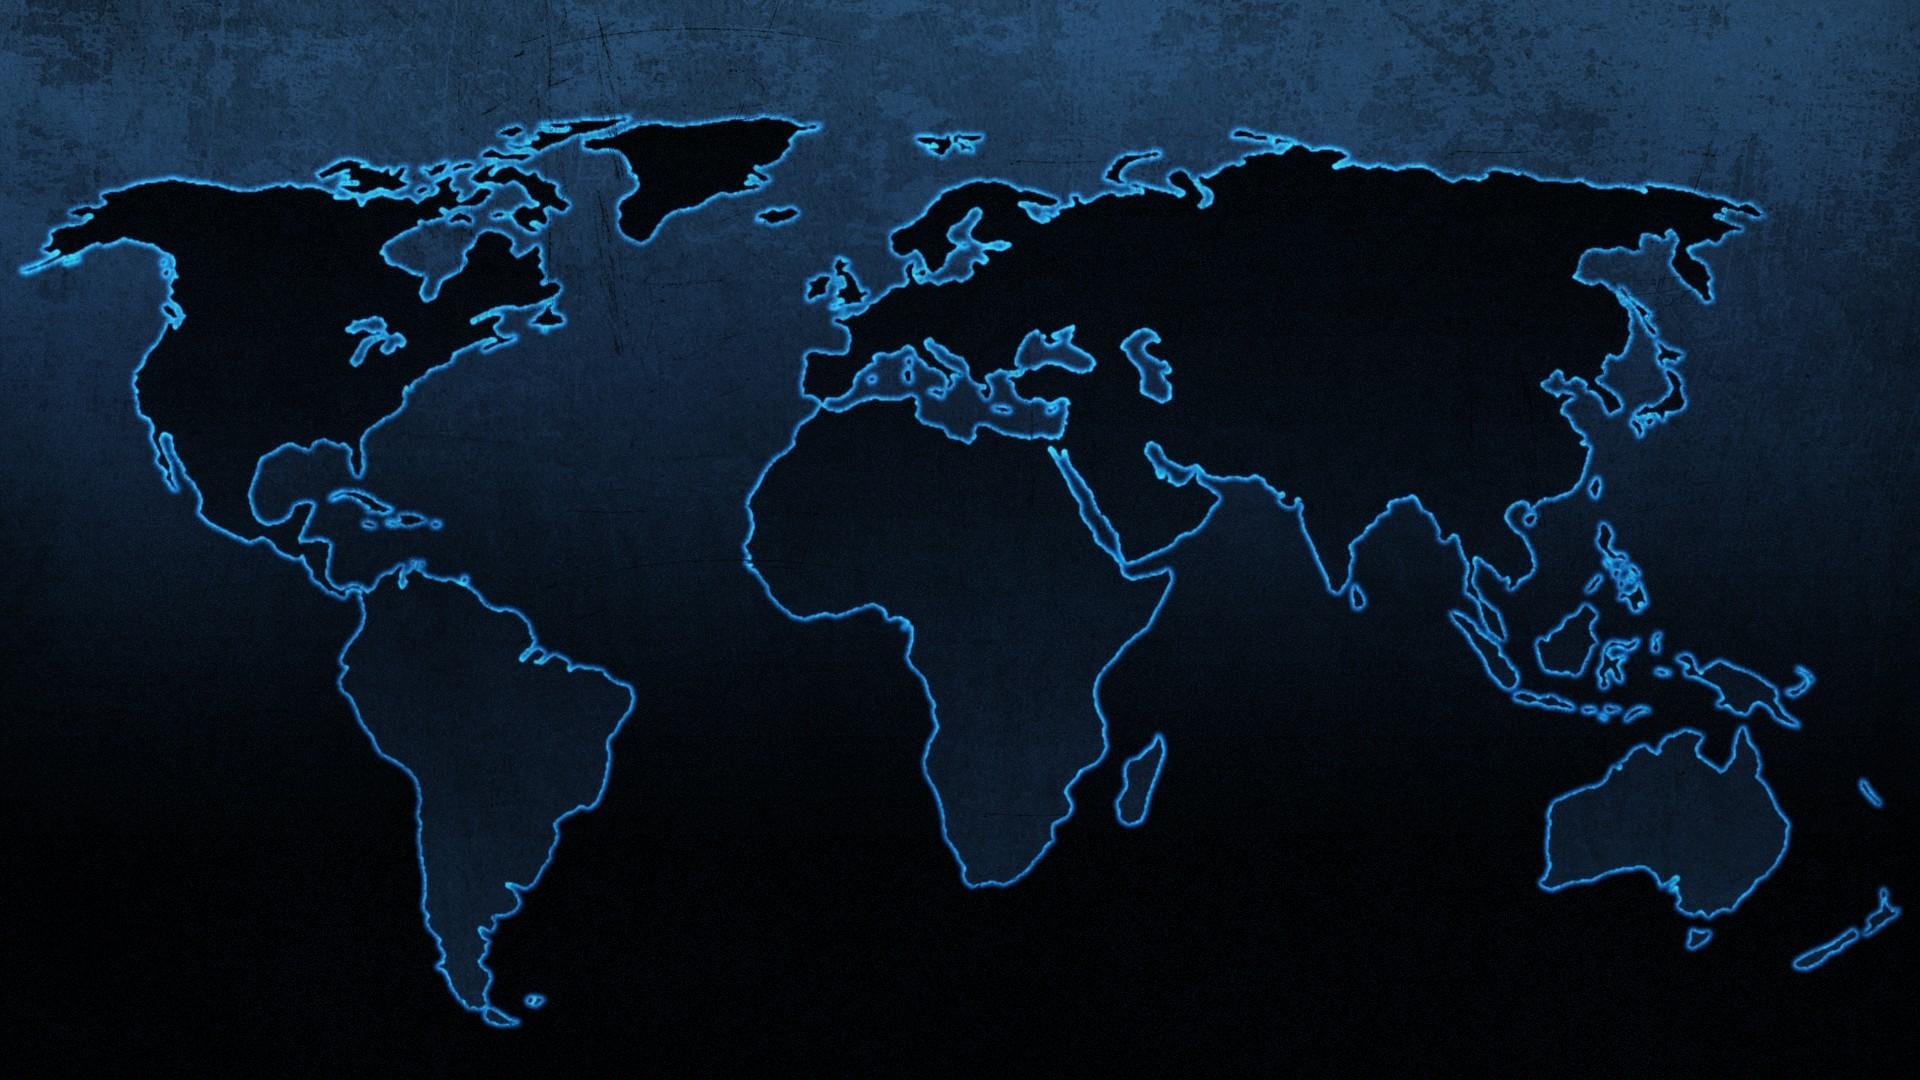 Blue continents maps world map wallpaper 1920x1080